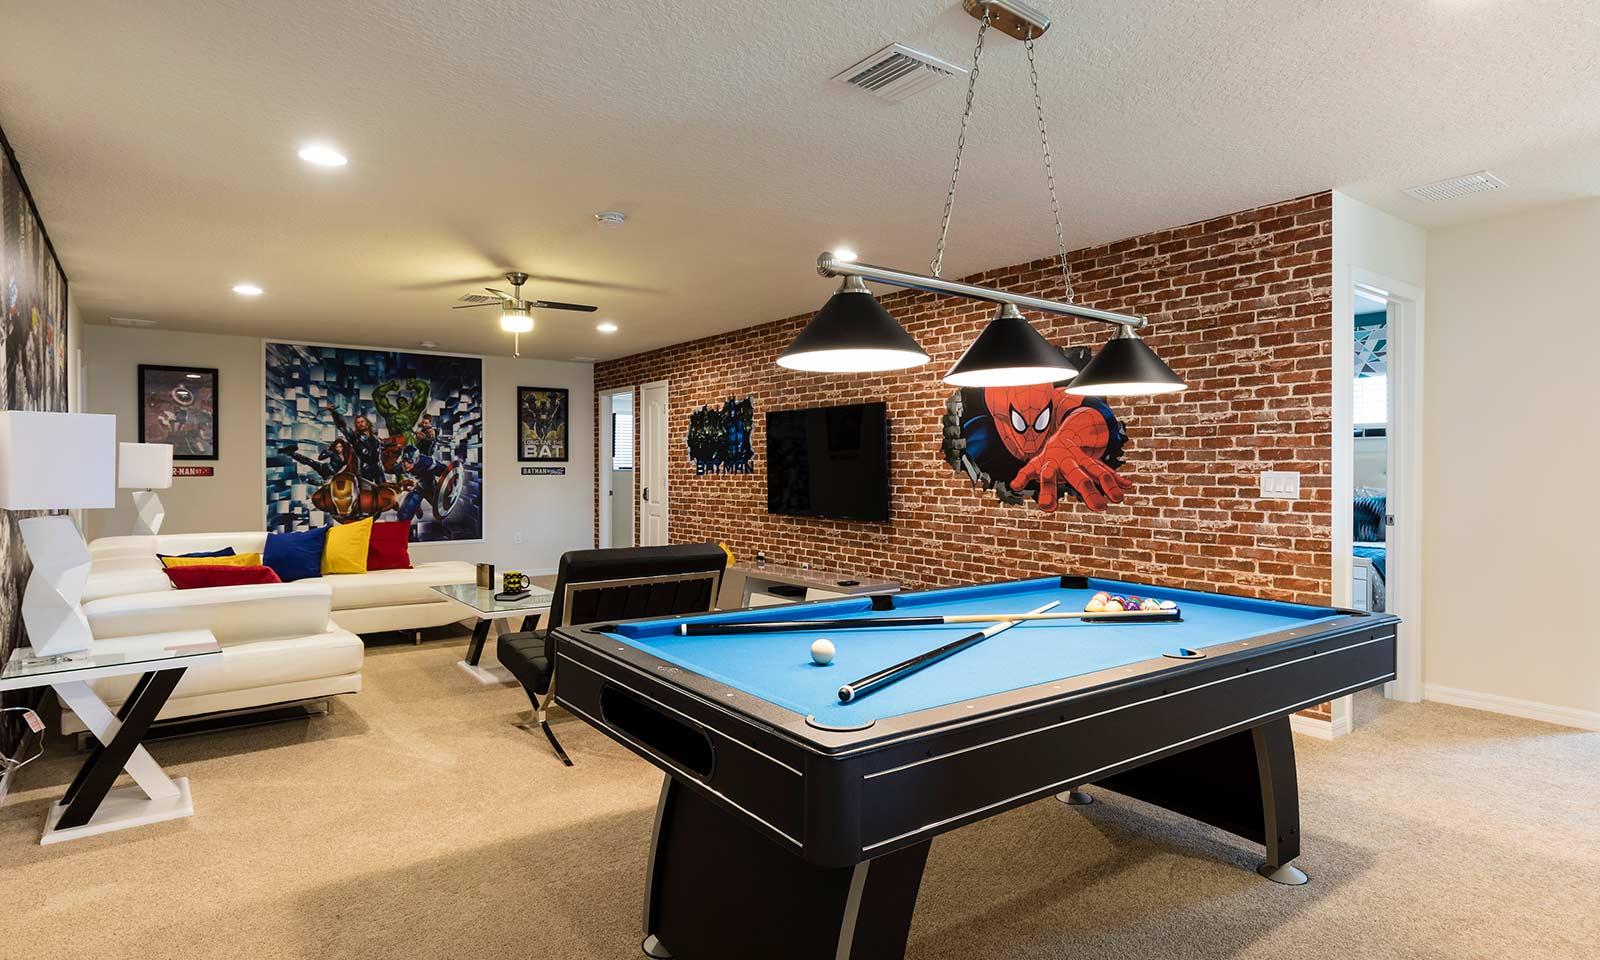 [amenities:entertainment-loft:3] Entertainment Loft